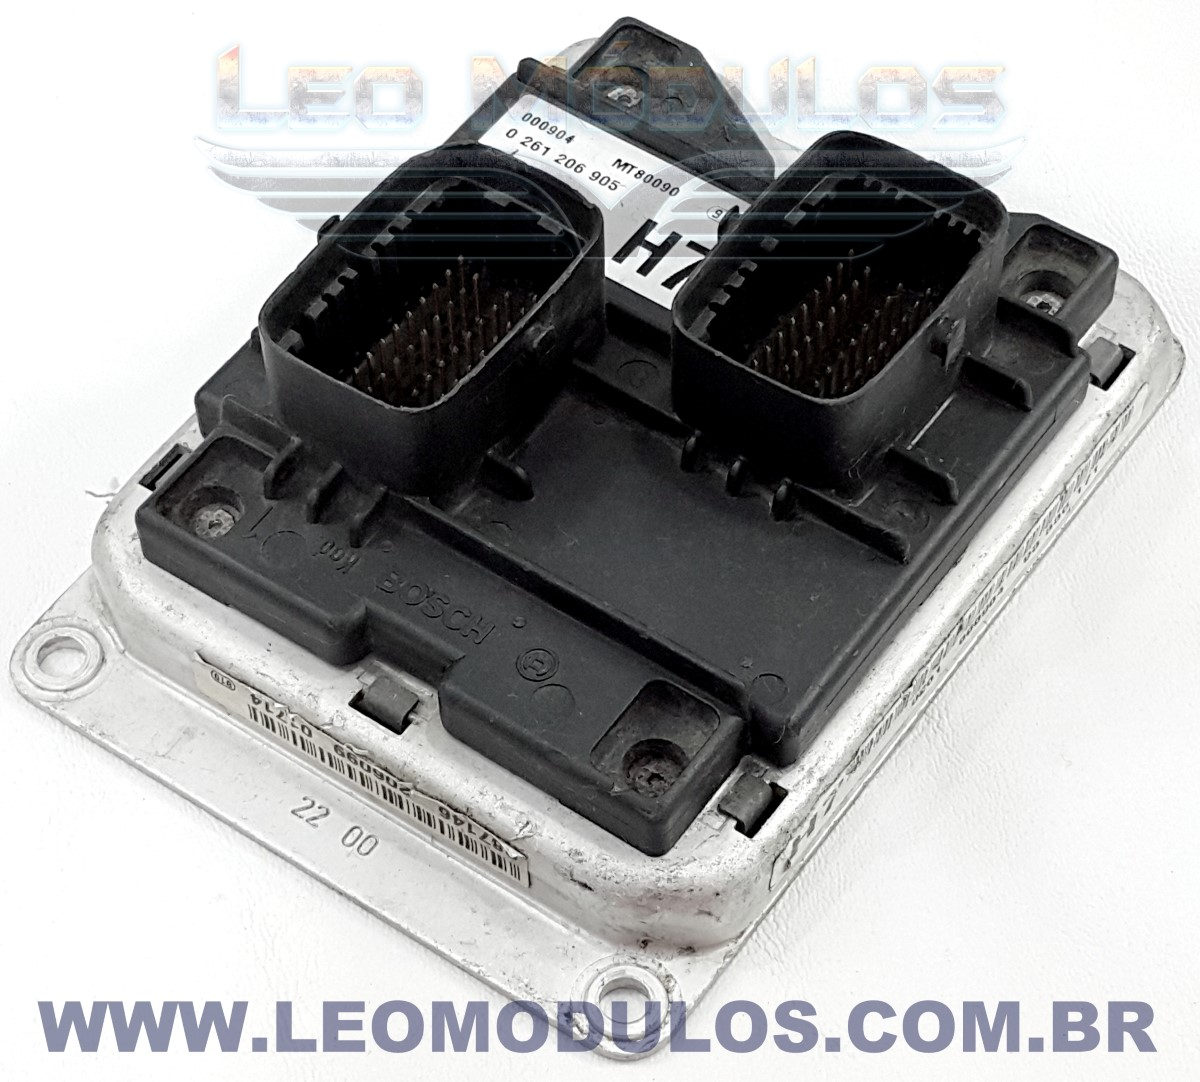 Módulo de injeção bosch M1.5.5 - 0261206905 H7 93336171 - Chevrolet Astra Zafira 1.8 8V - 0 261 206 905 - Leo Módulos